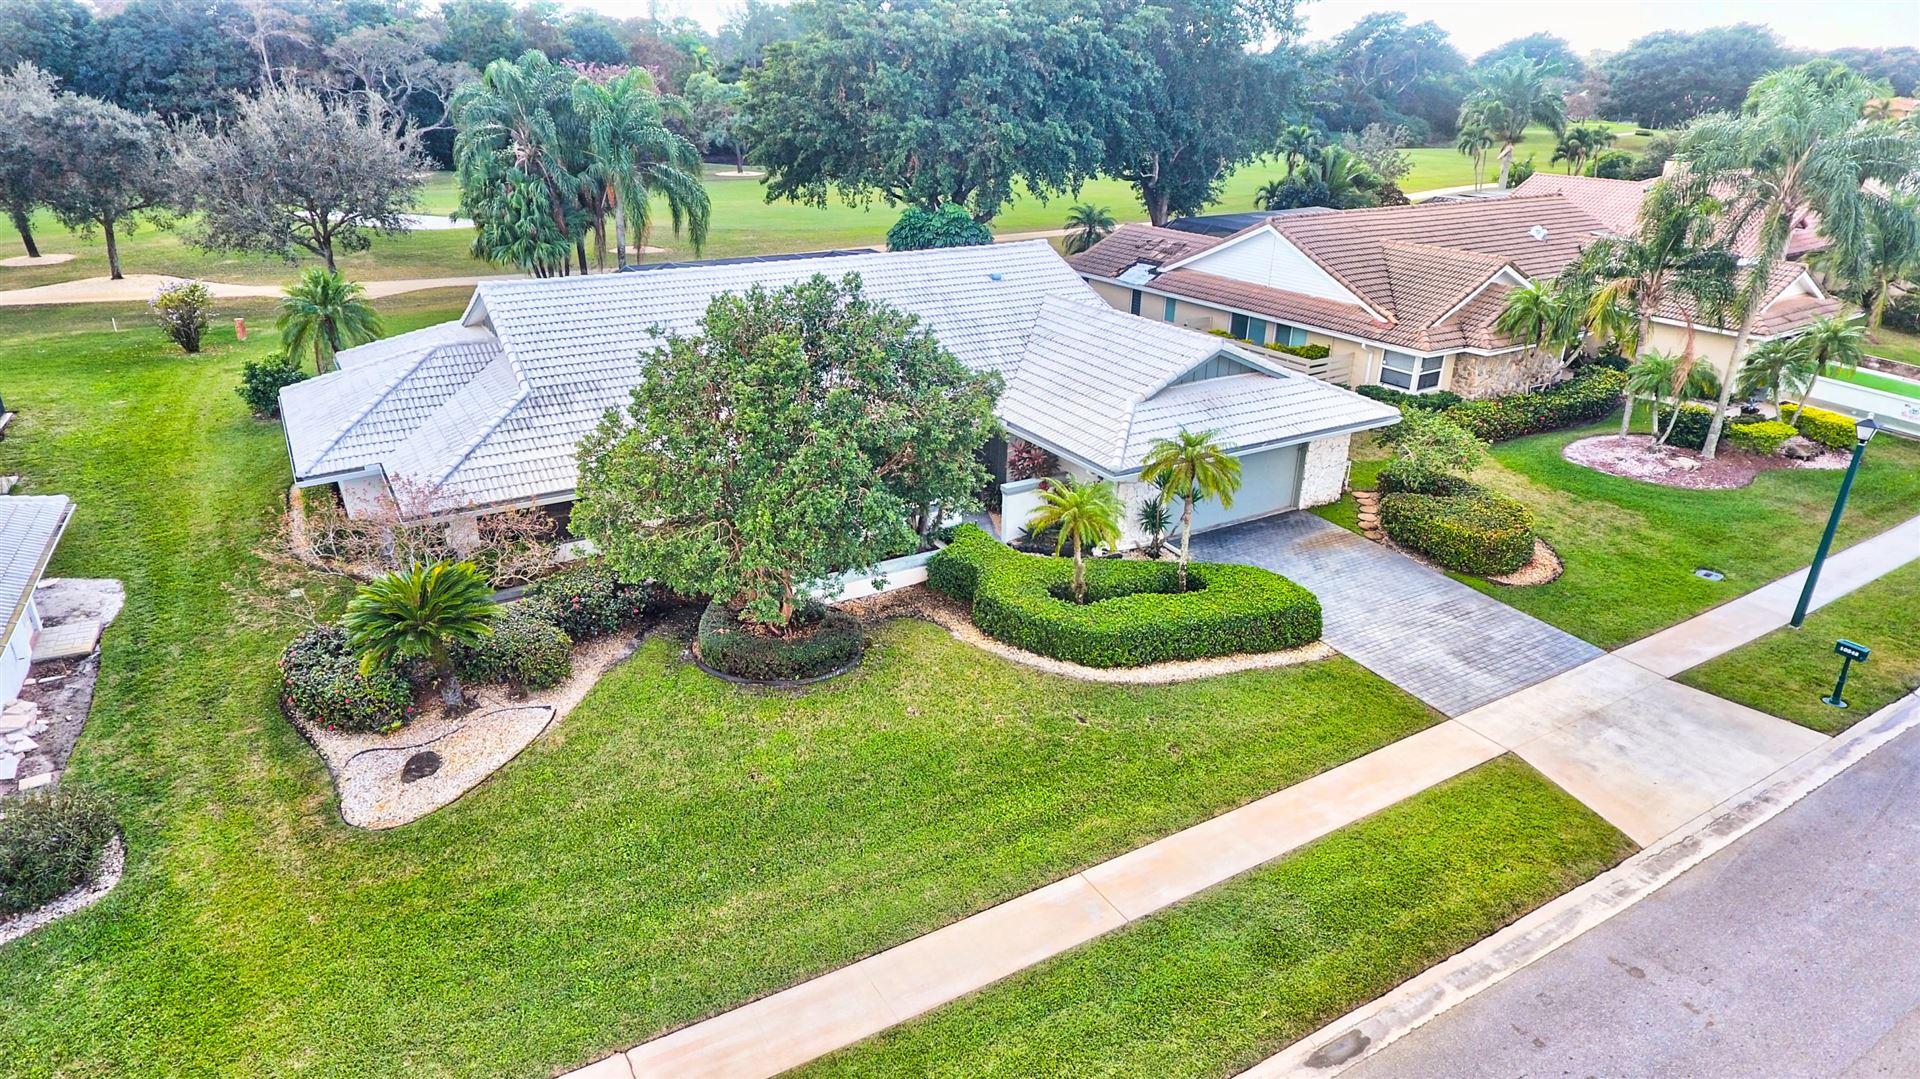 10342 Boca Woods Lane, Boca Raton, FL 33428 - #: RX-10682879